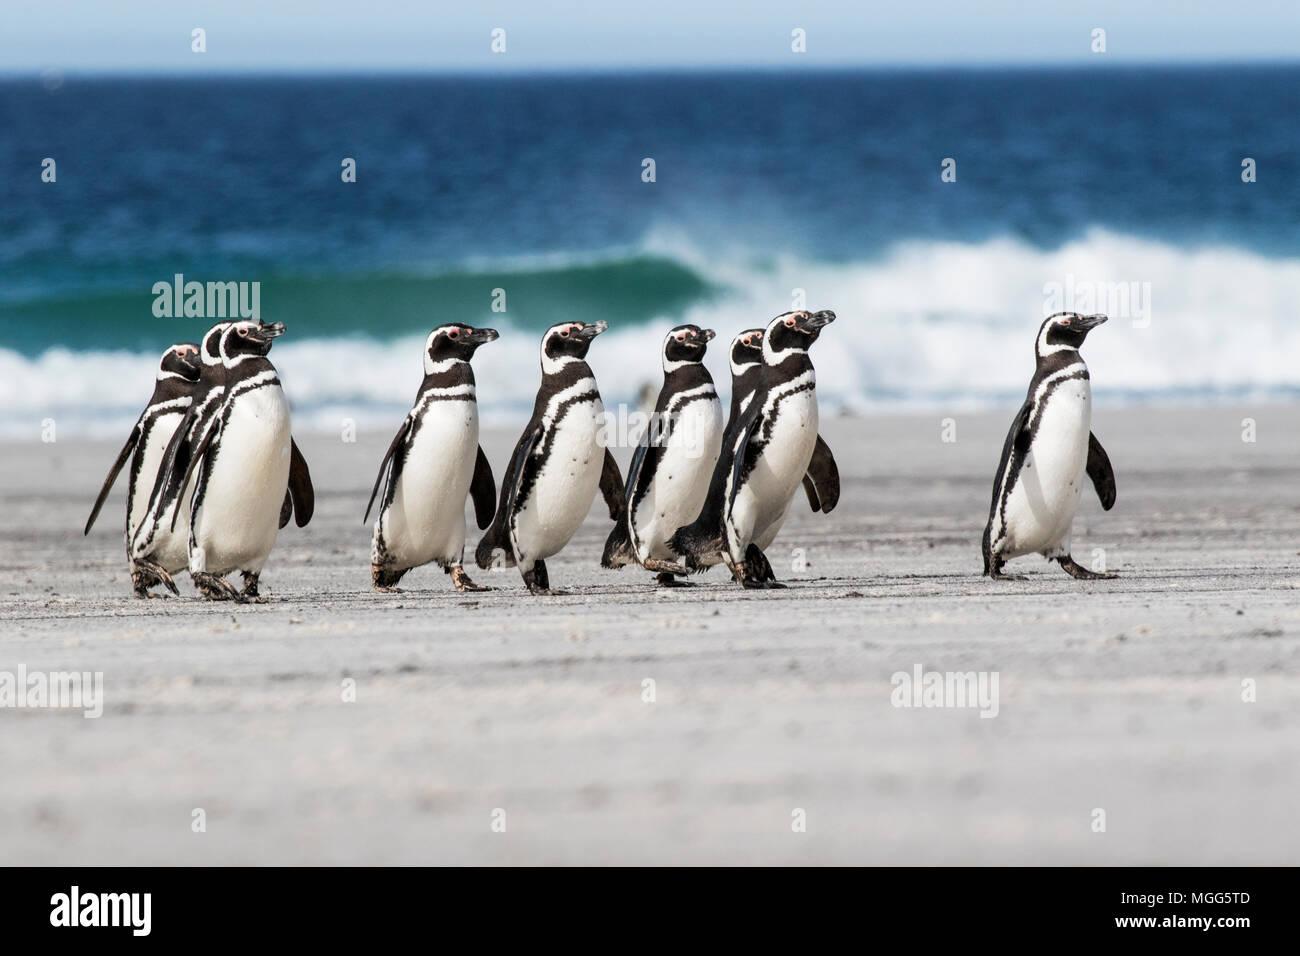 Magellanic penguin Spheniscus magellanicus group of adults walking on beach near breeding colony, Saunders Island, Falkland Islands Stock Photo